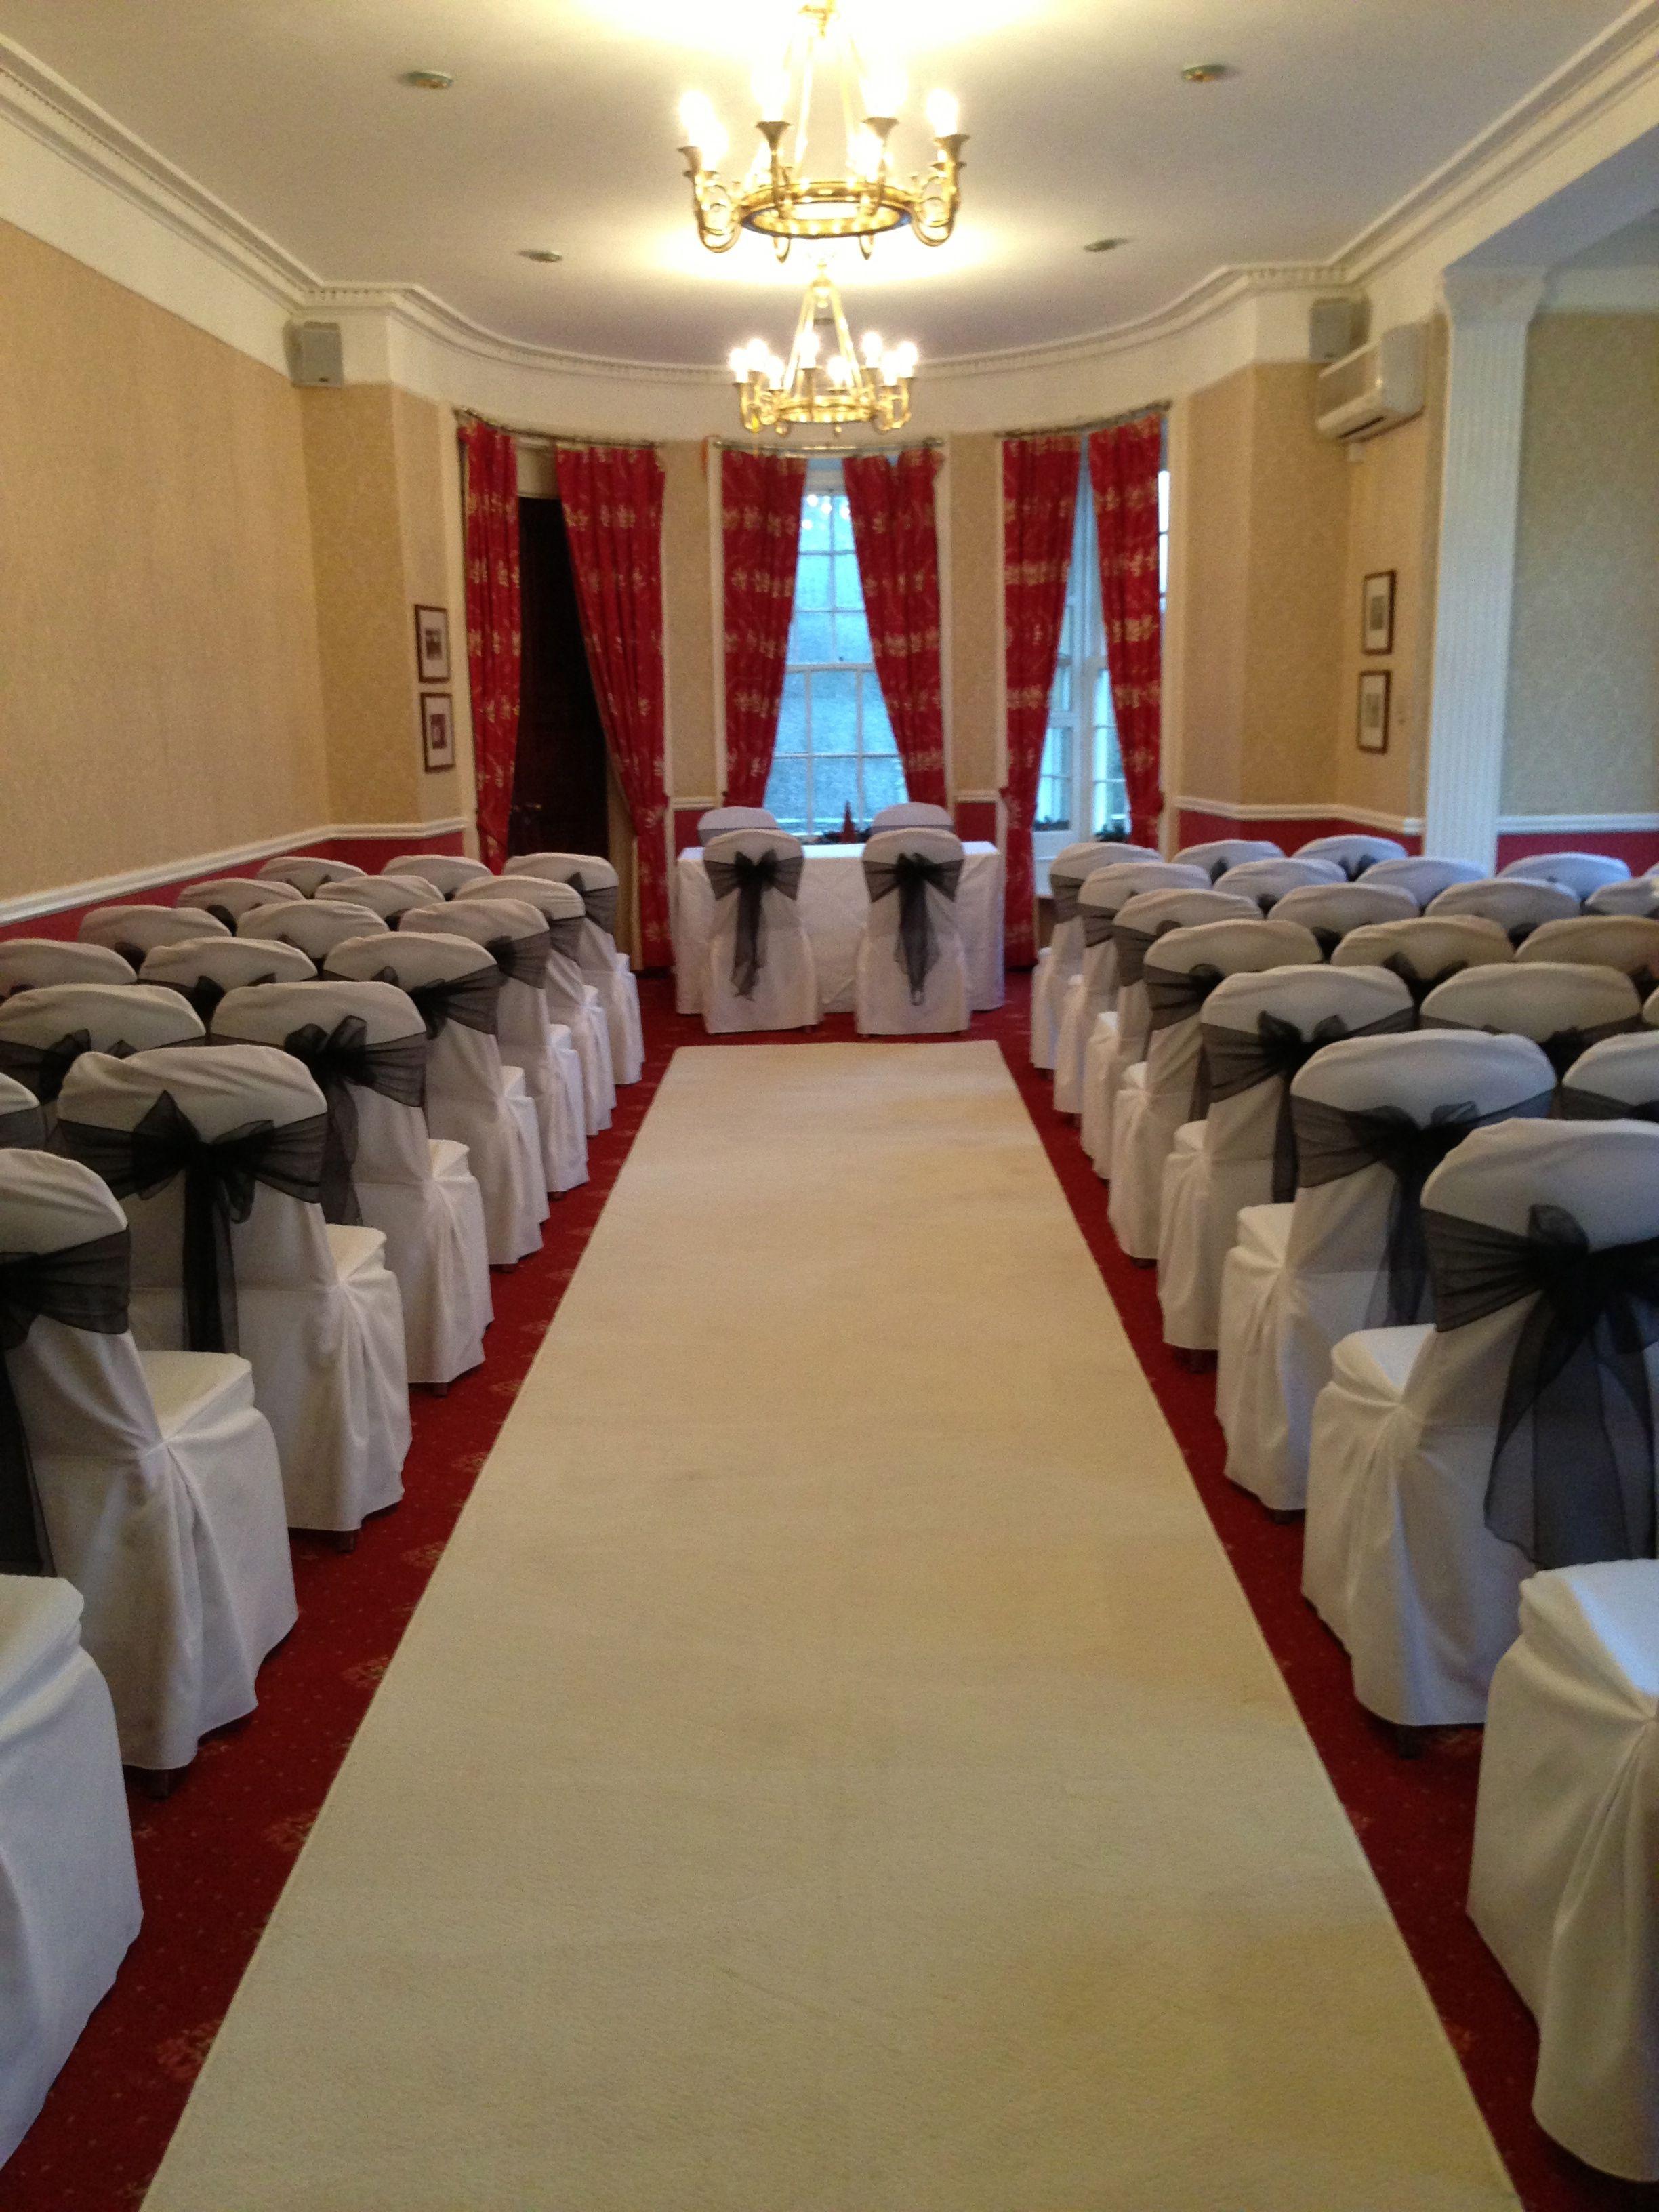 Wedding venue decoration images  Ceremony Room  GK Chesterton  Venue  Wedding Venue u Decoration